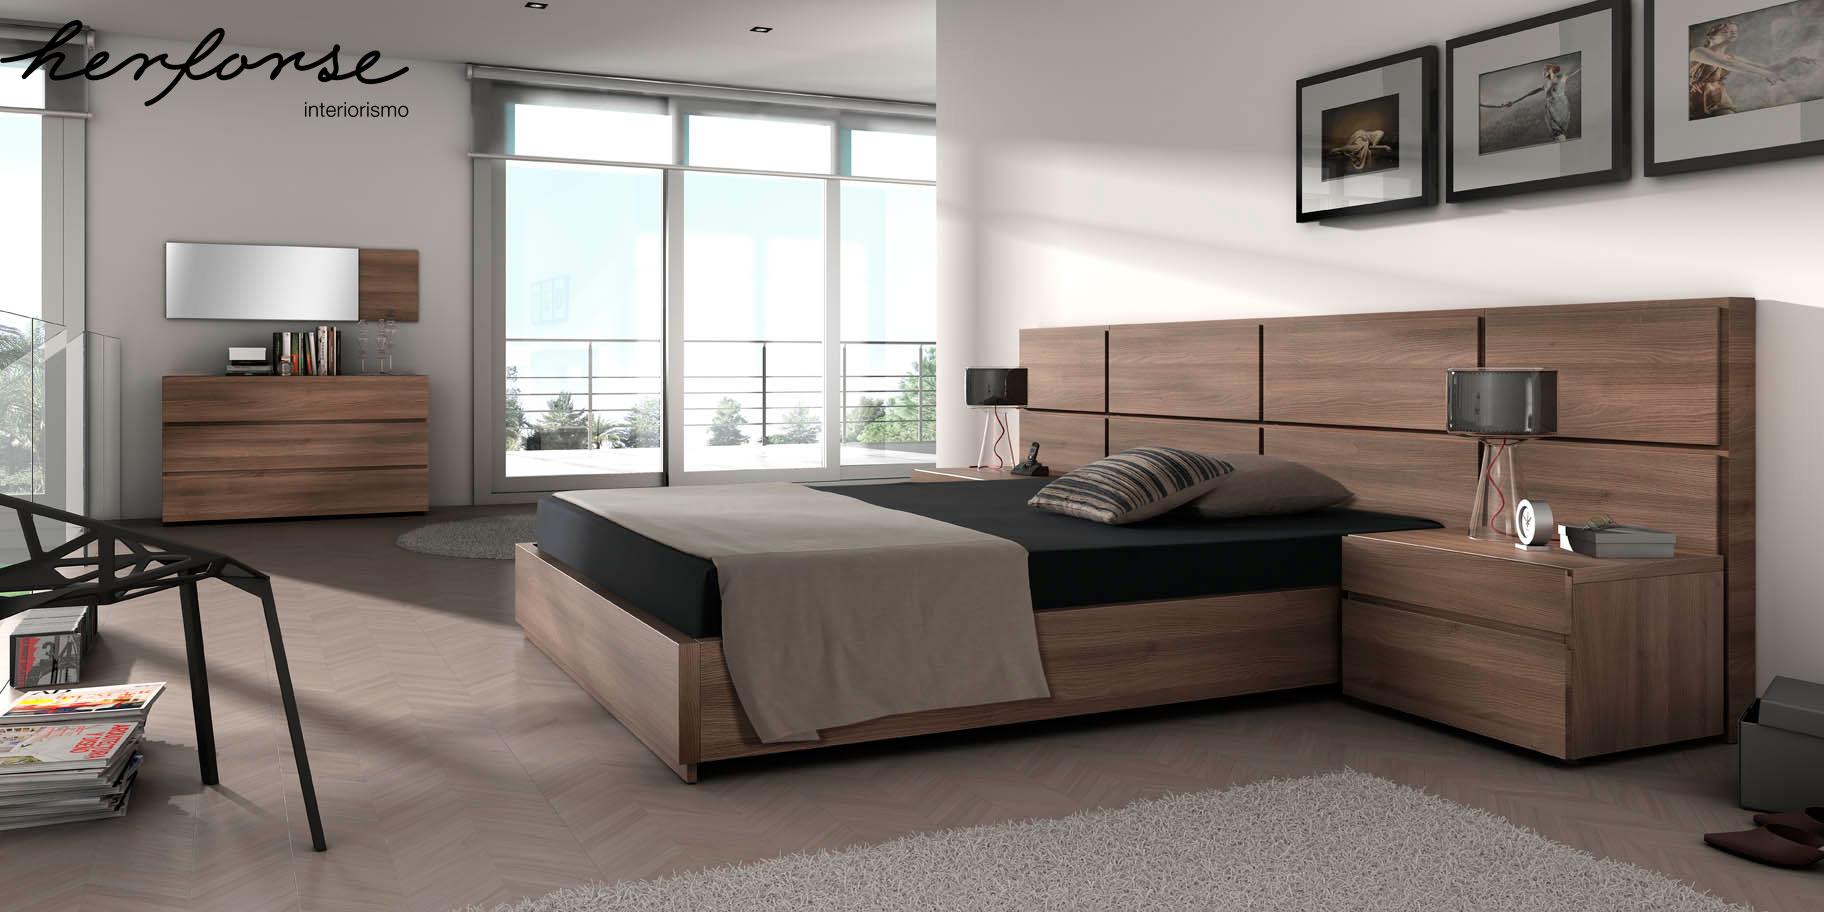 Modernos vanguardia dormitorios herforseinteriorismo for Tocadores modernos para recamaras